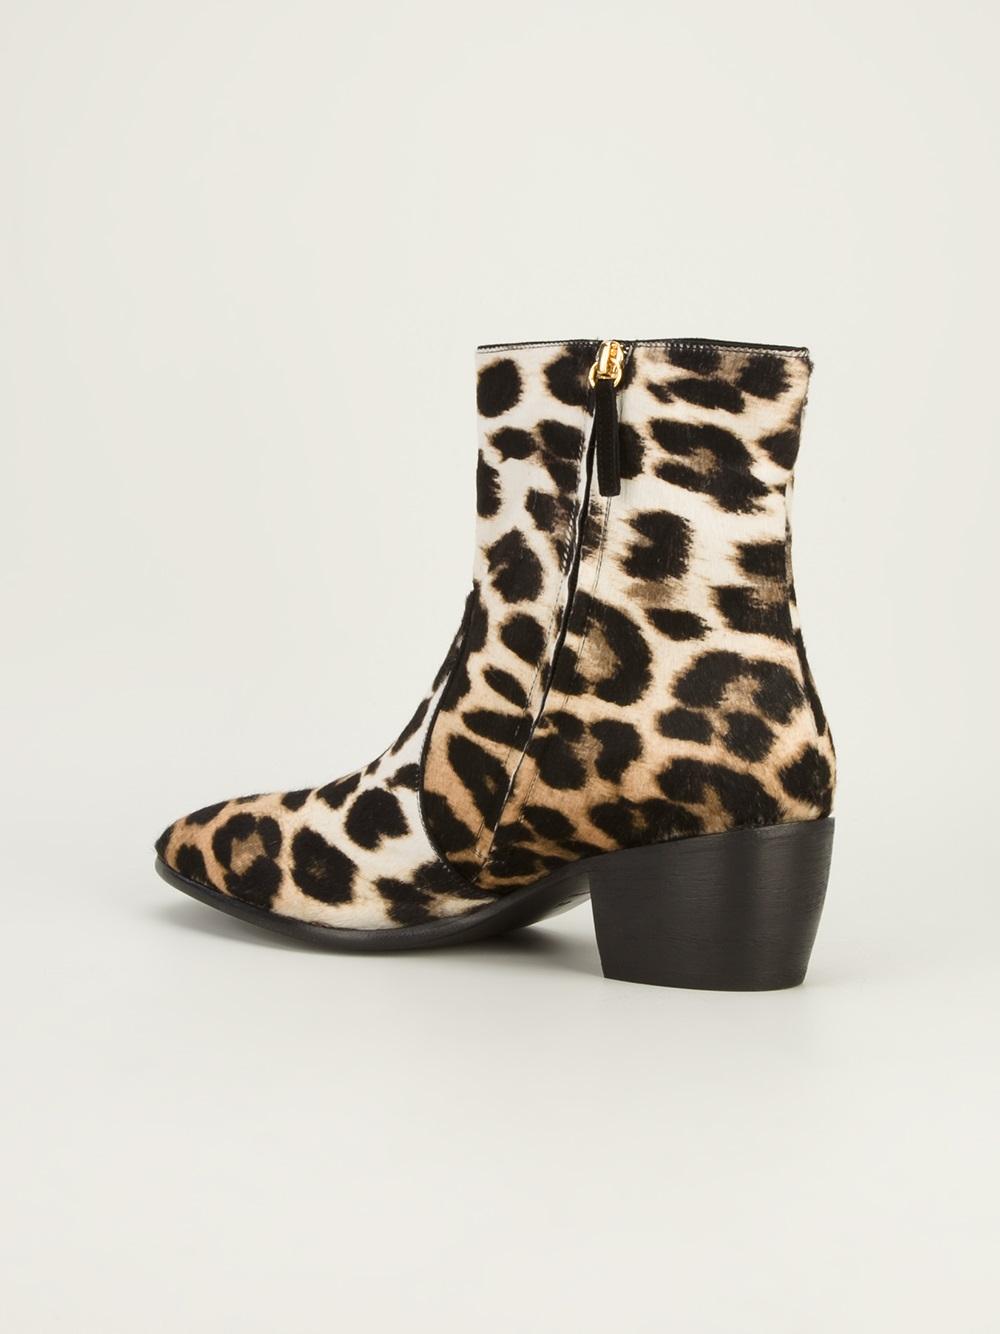 Giuseppe zanotti Leopard Print Ankle Boots in Beige for ...